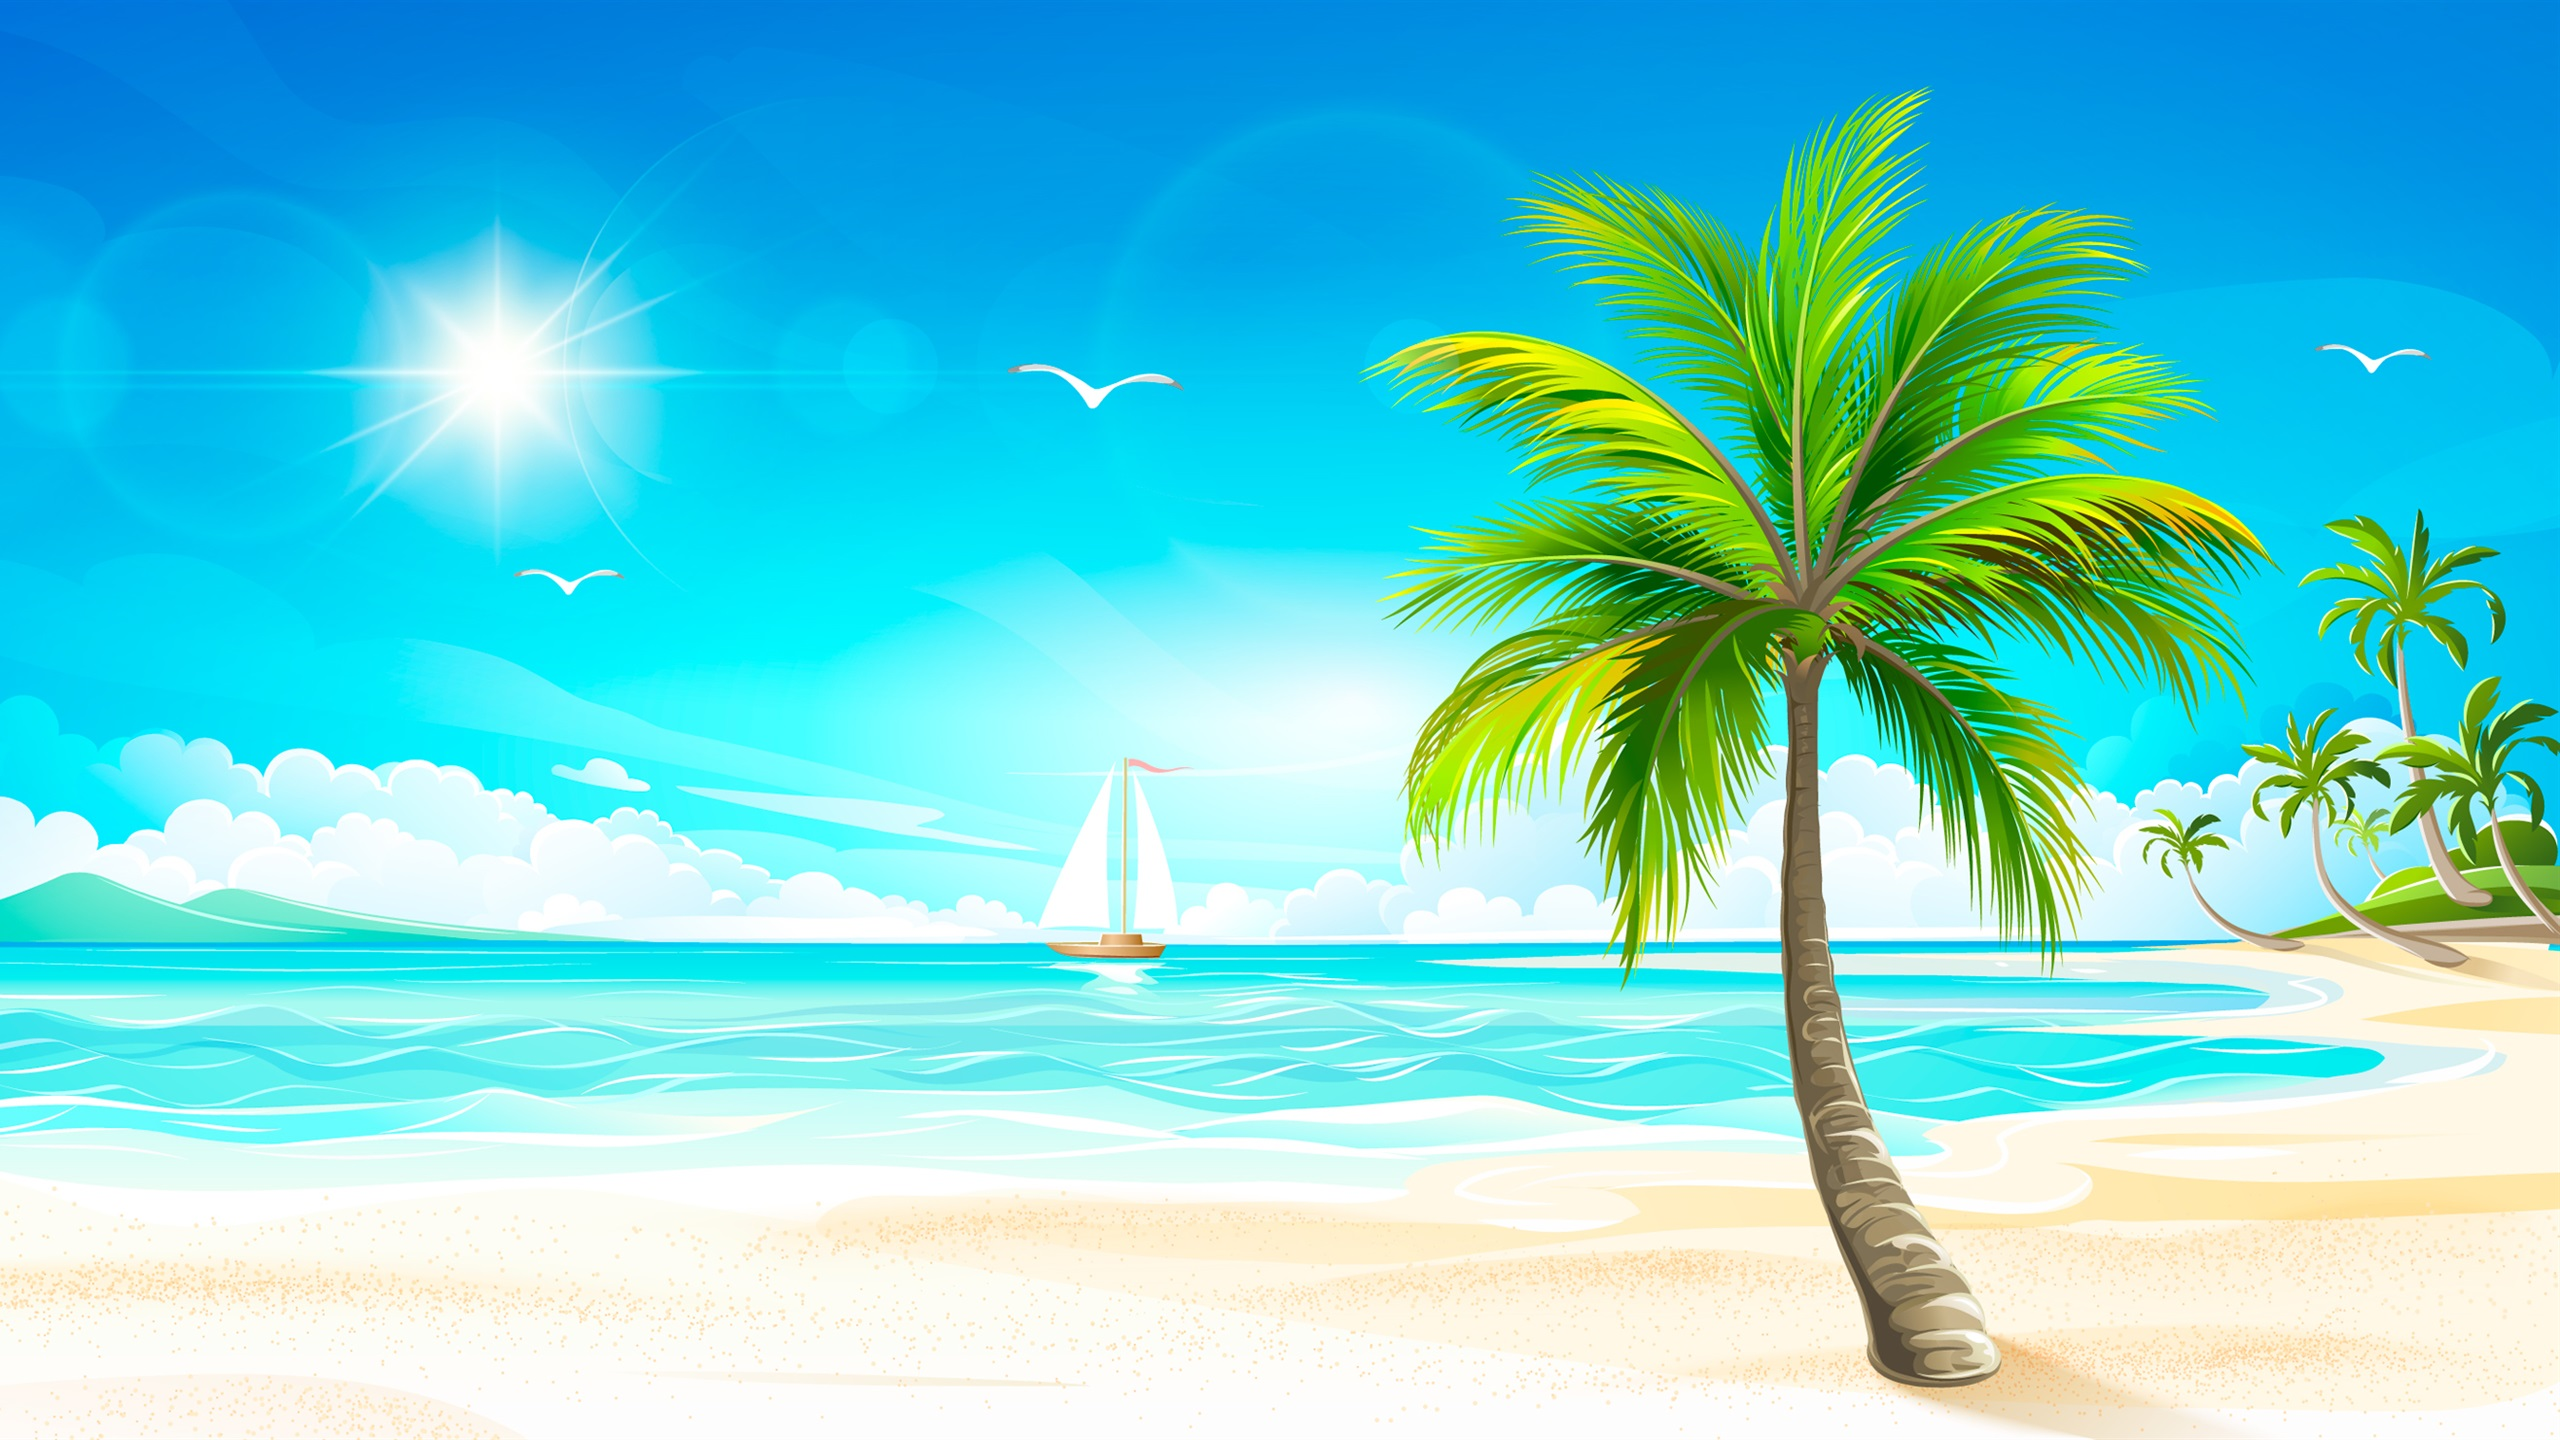 Fondos de pantalla vector de dise o playa palmeras sol mar barcos aves 2560x1440 qhd imagen - Playa wallpaper ...